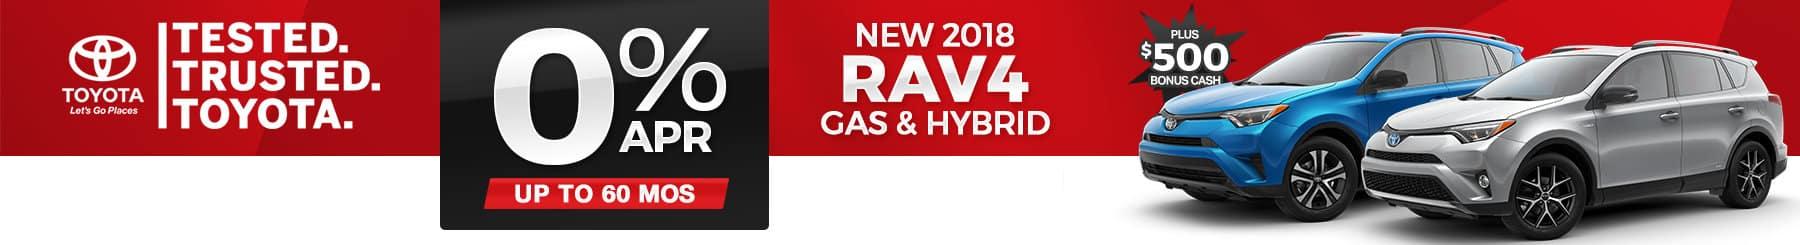 2018-Toyota-Rav4-Finance-Special